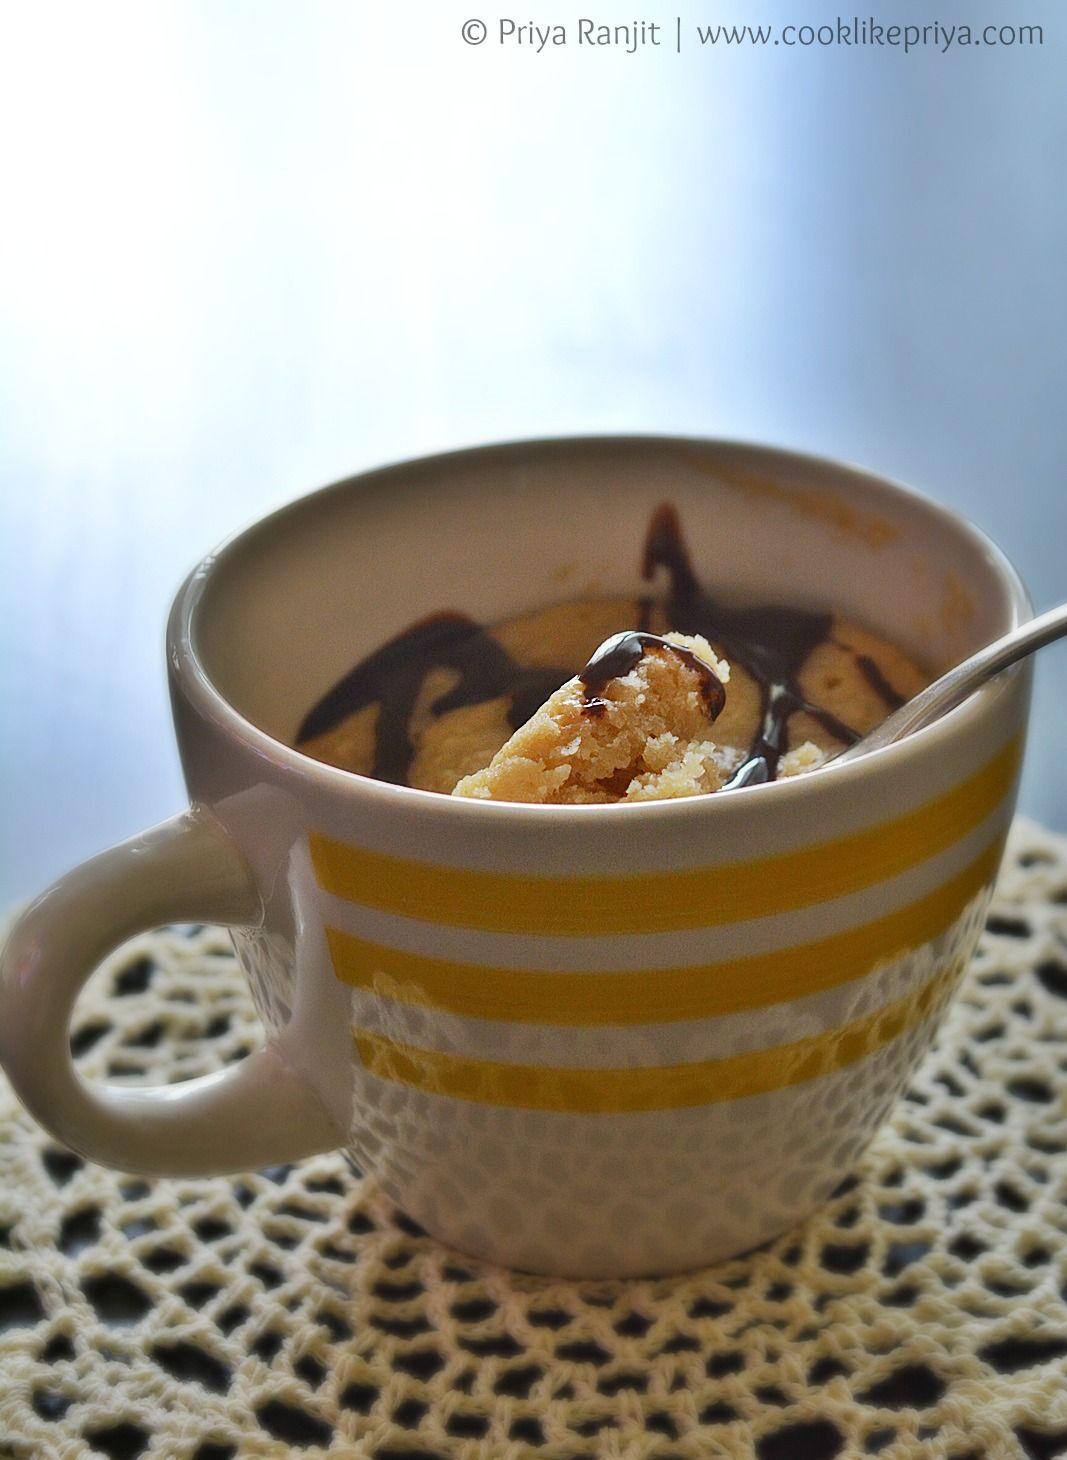 Eggless Mug Cake Recipe Vanilla mug cakes, Mug cake, Recipes